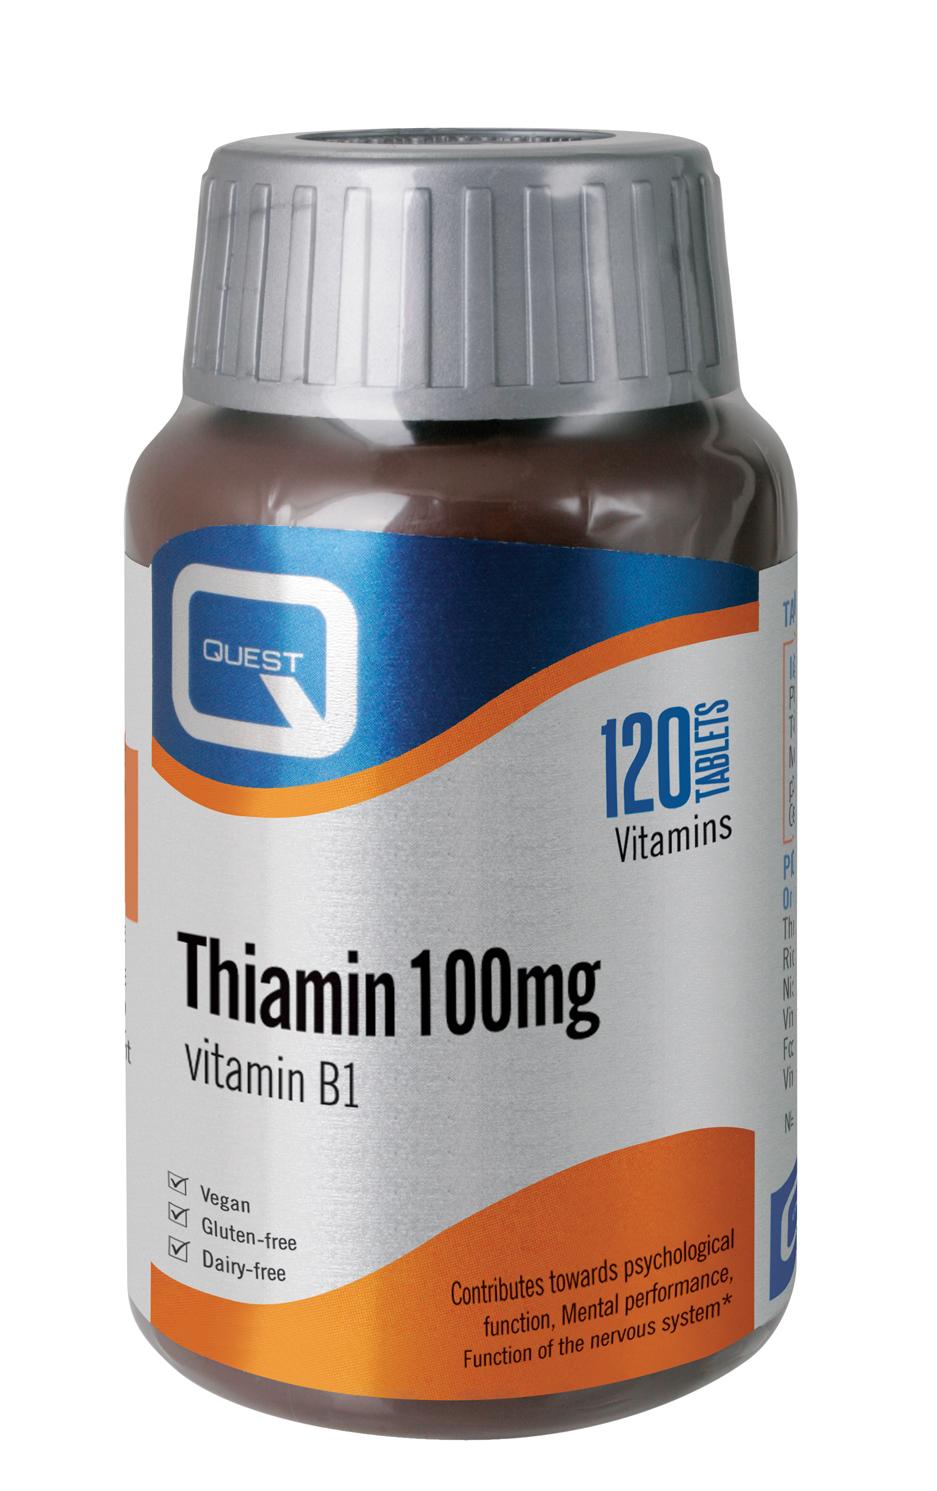 Thiamin (Vitamin B1) 100mg 120's